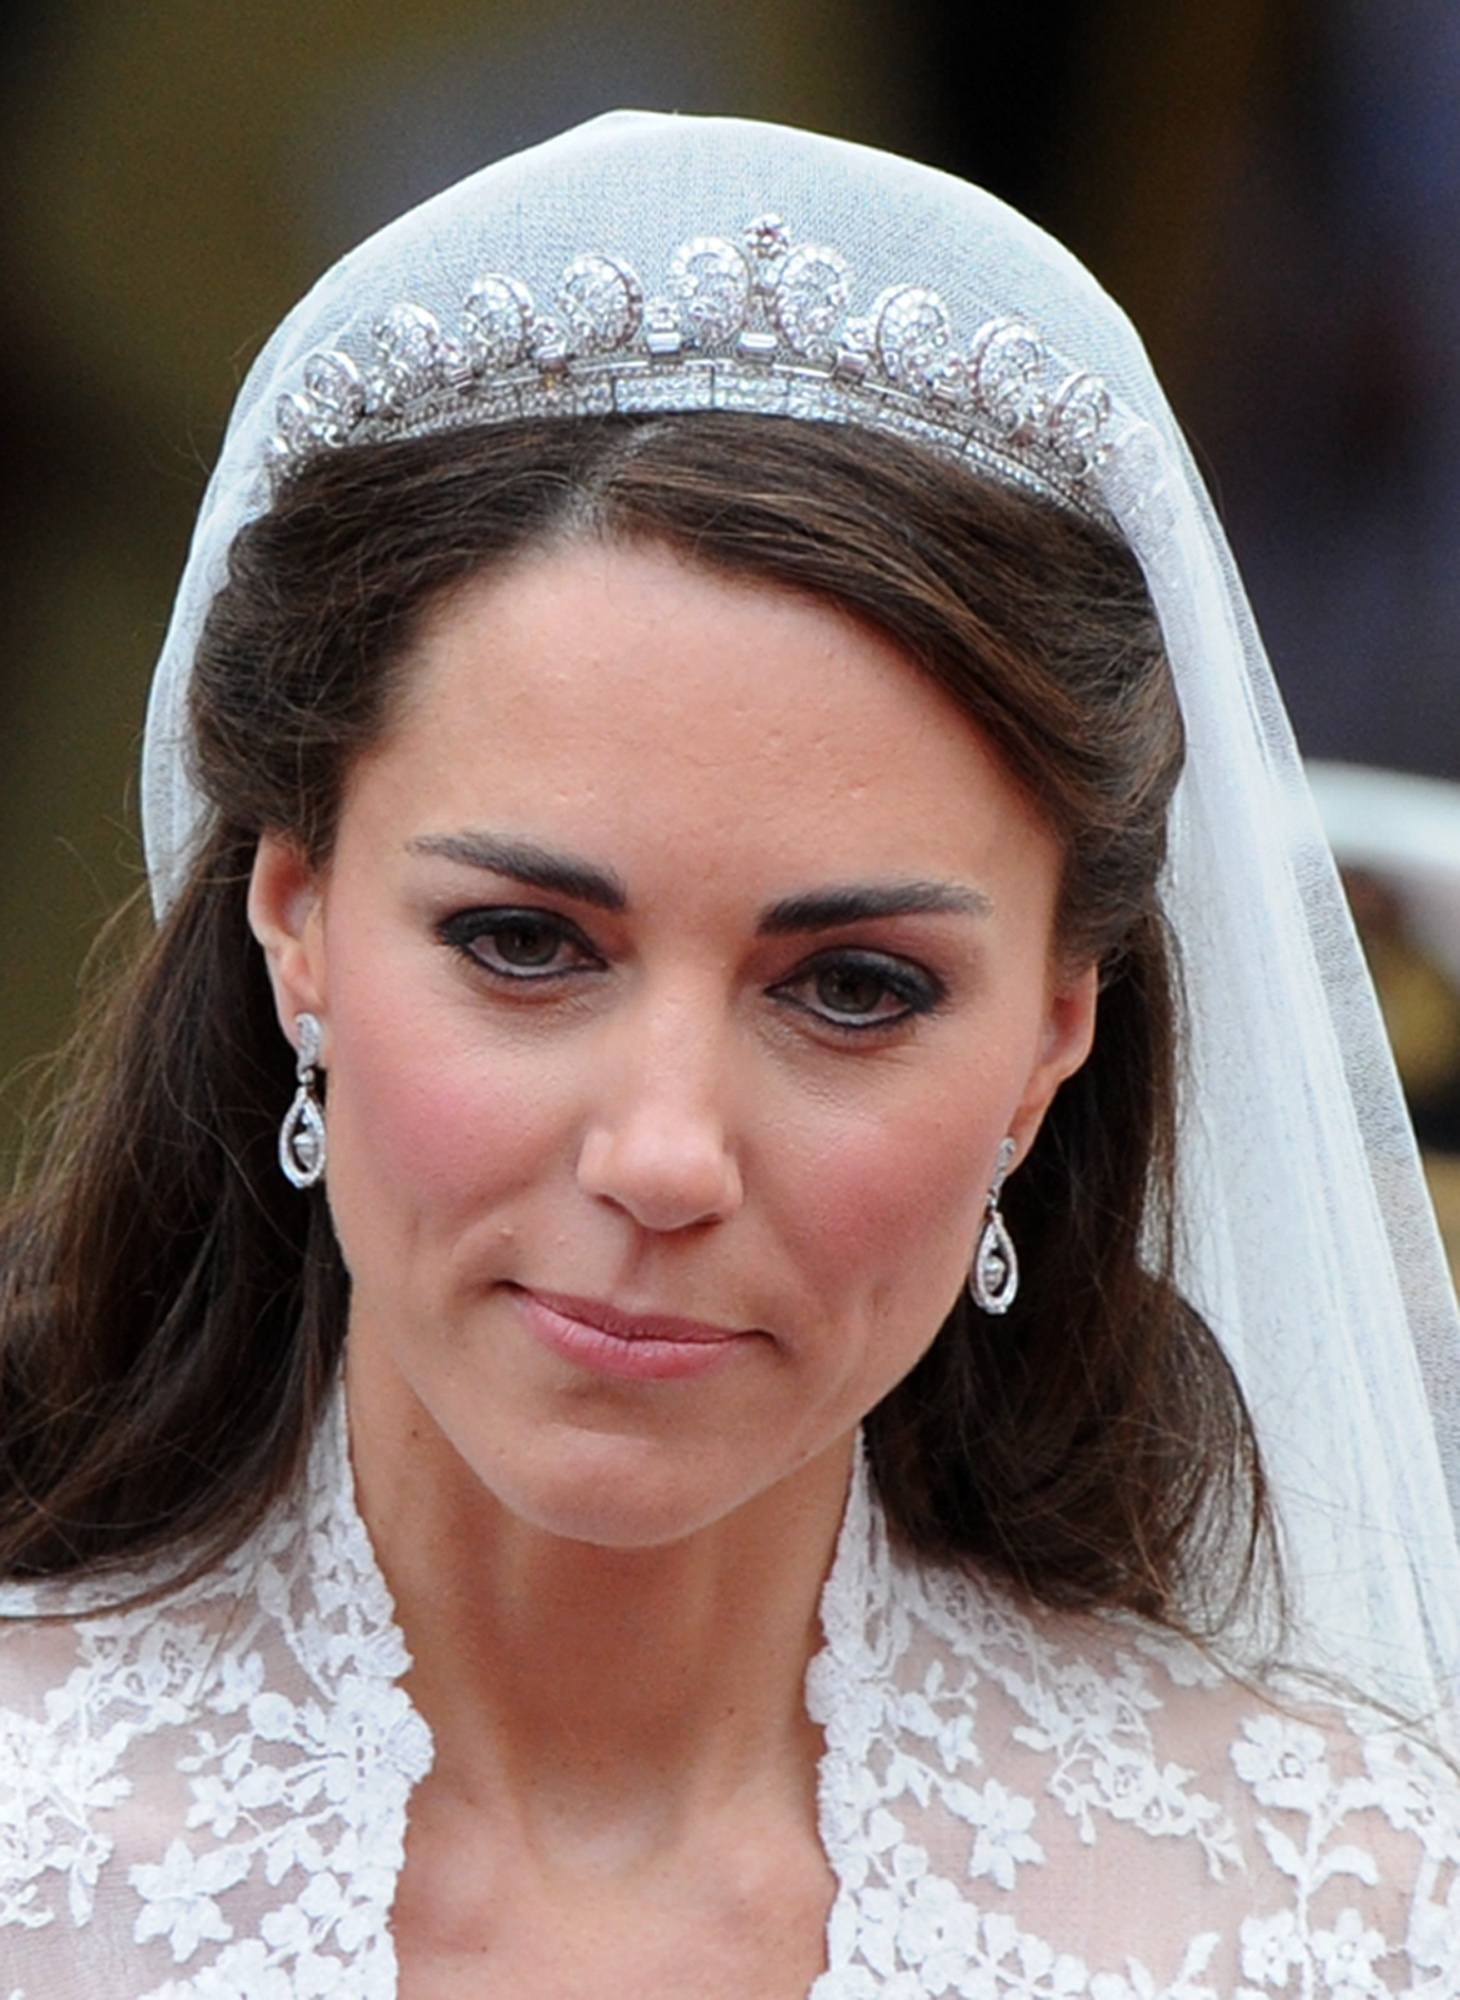 Kate Middleton, Duchess of Cambridge, wearing the Cartier 'halo' tiara on her wedding day